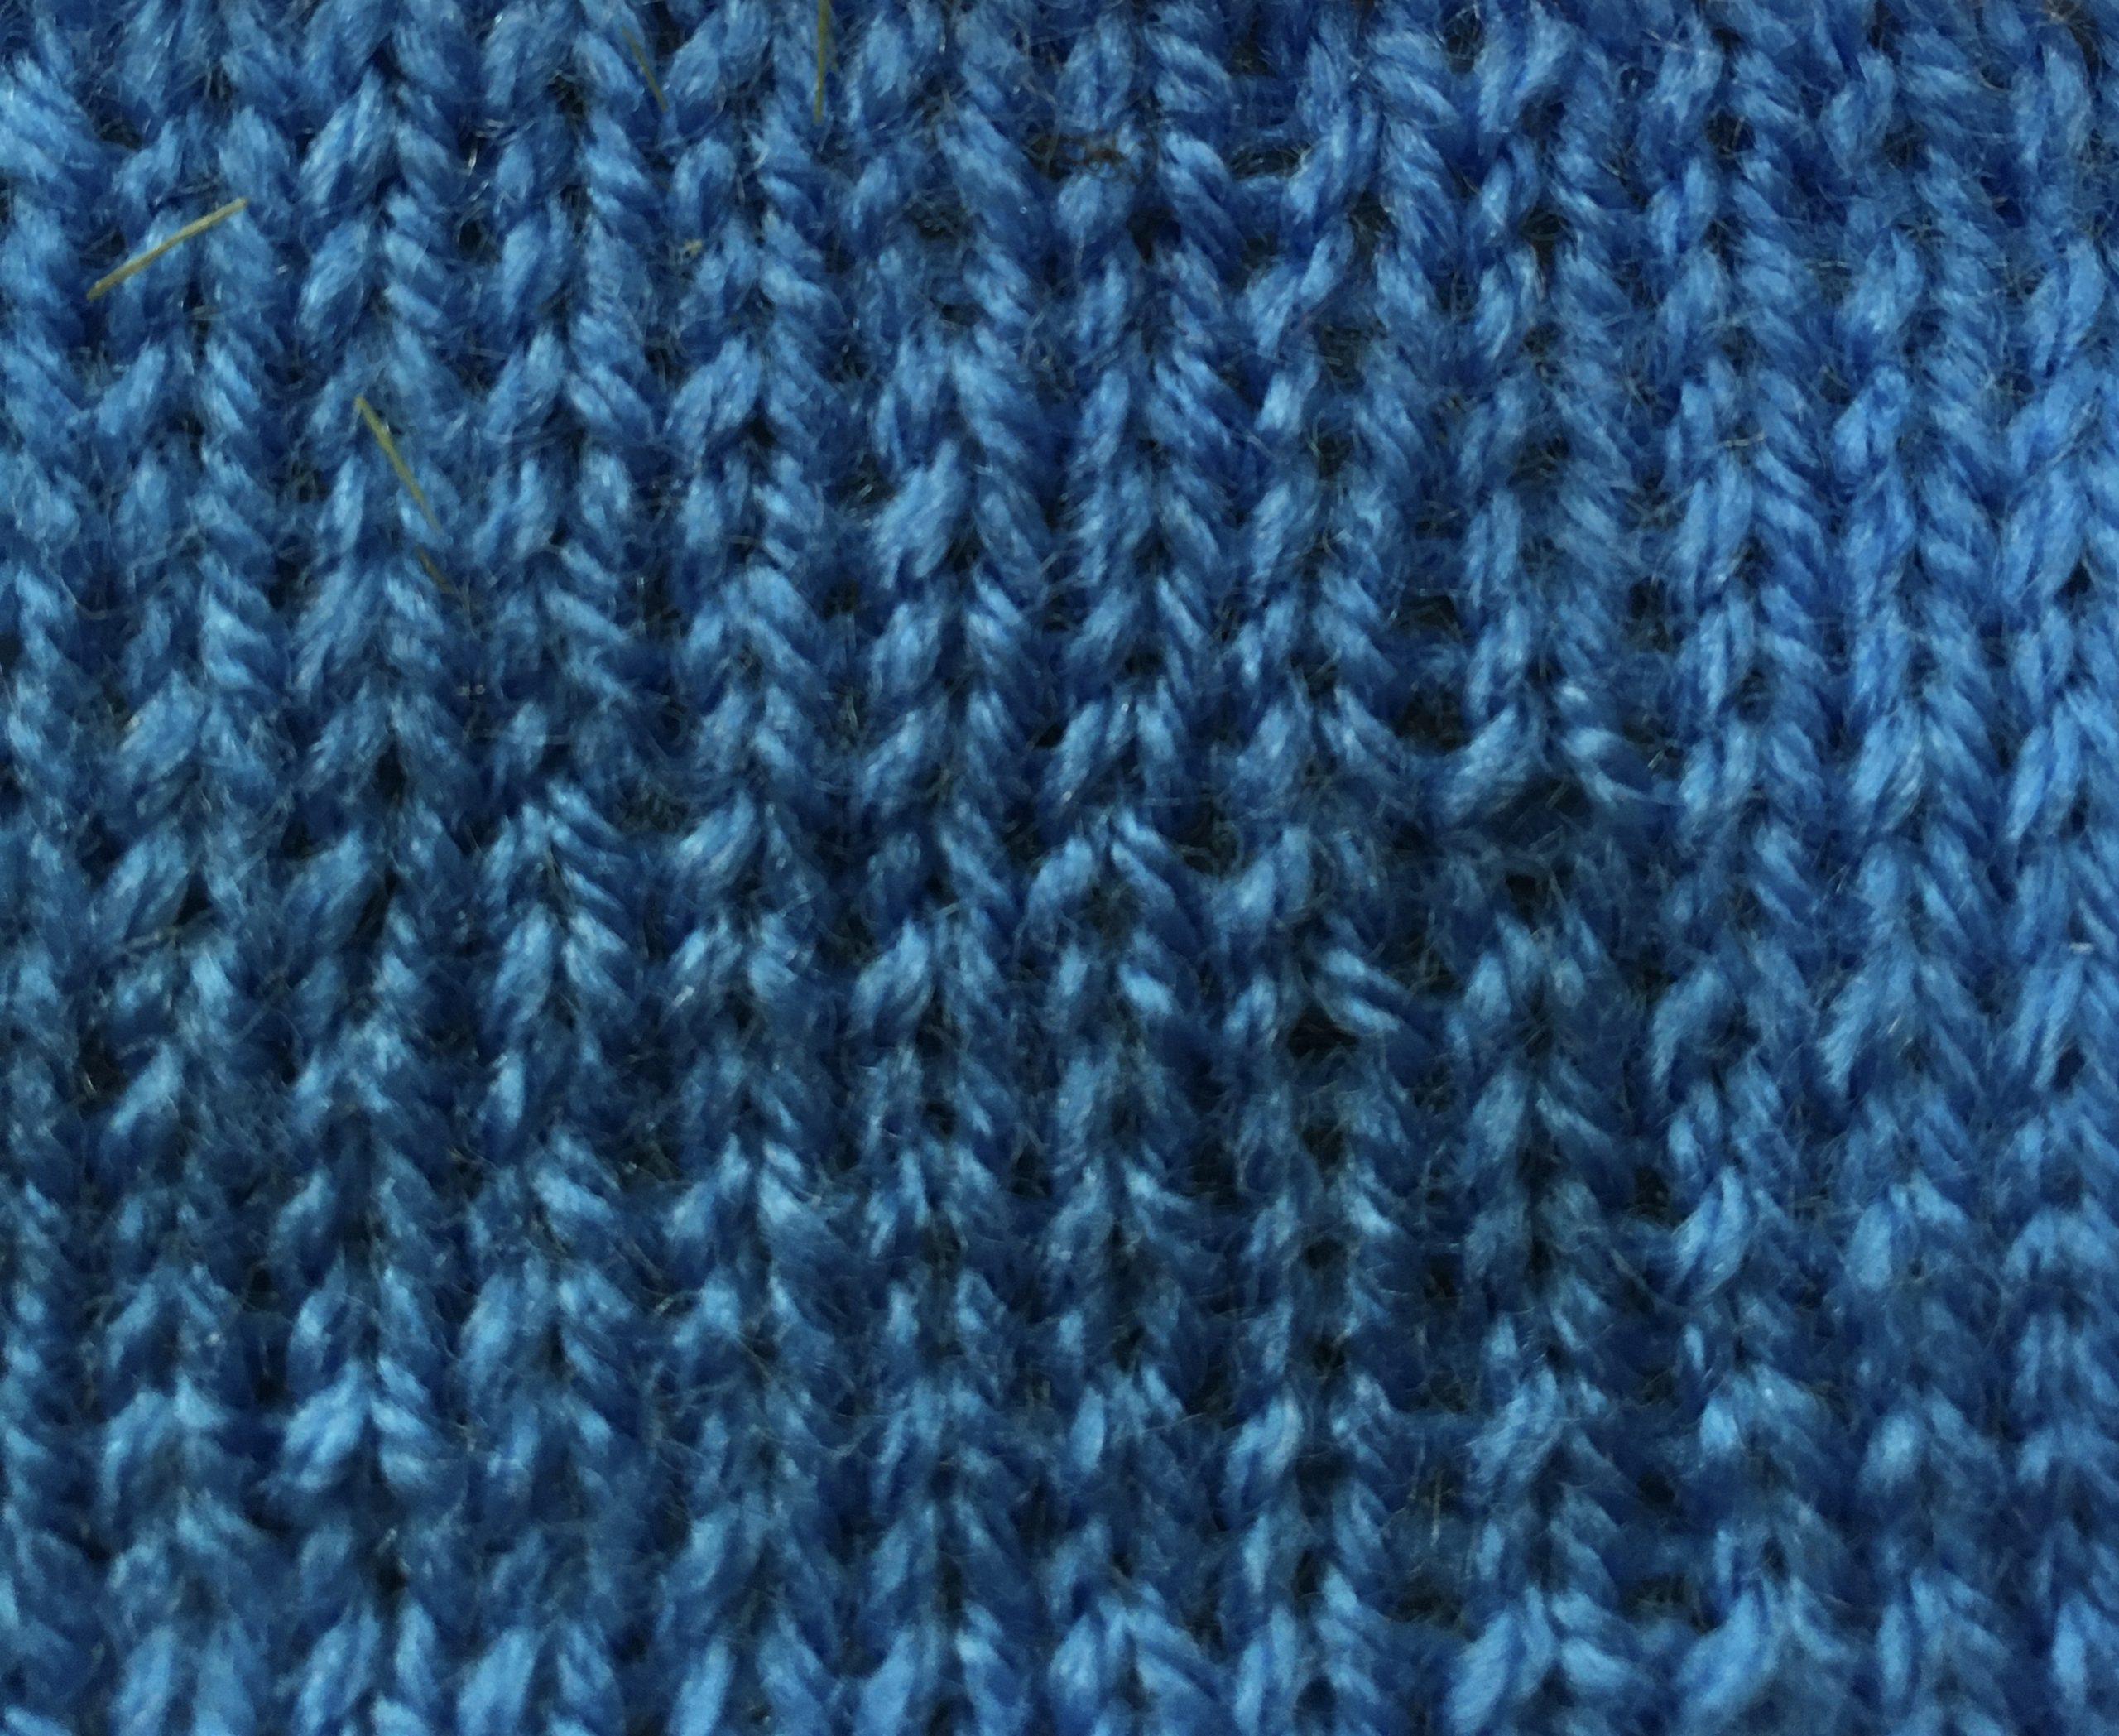 Stocking stitch